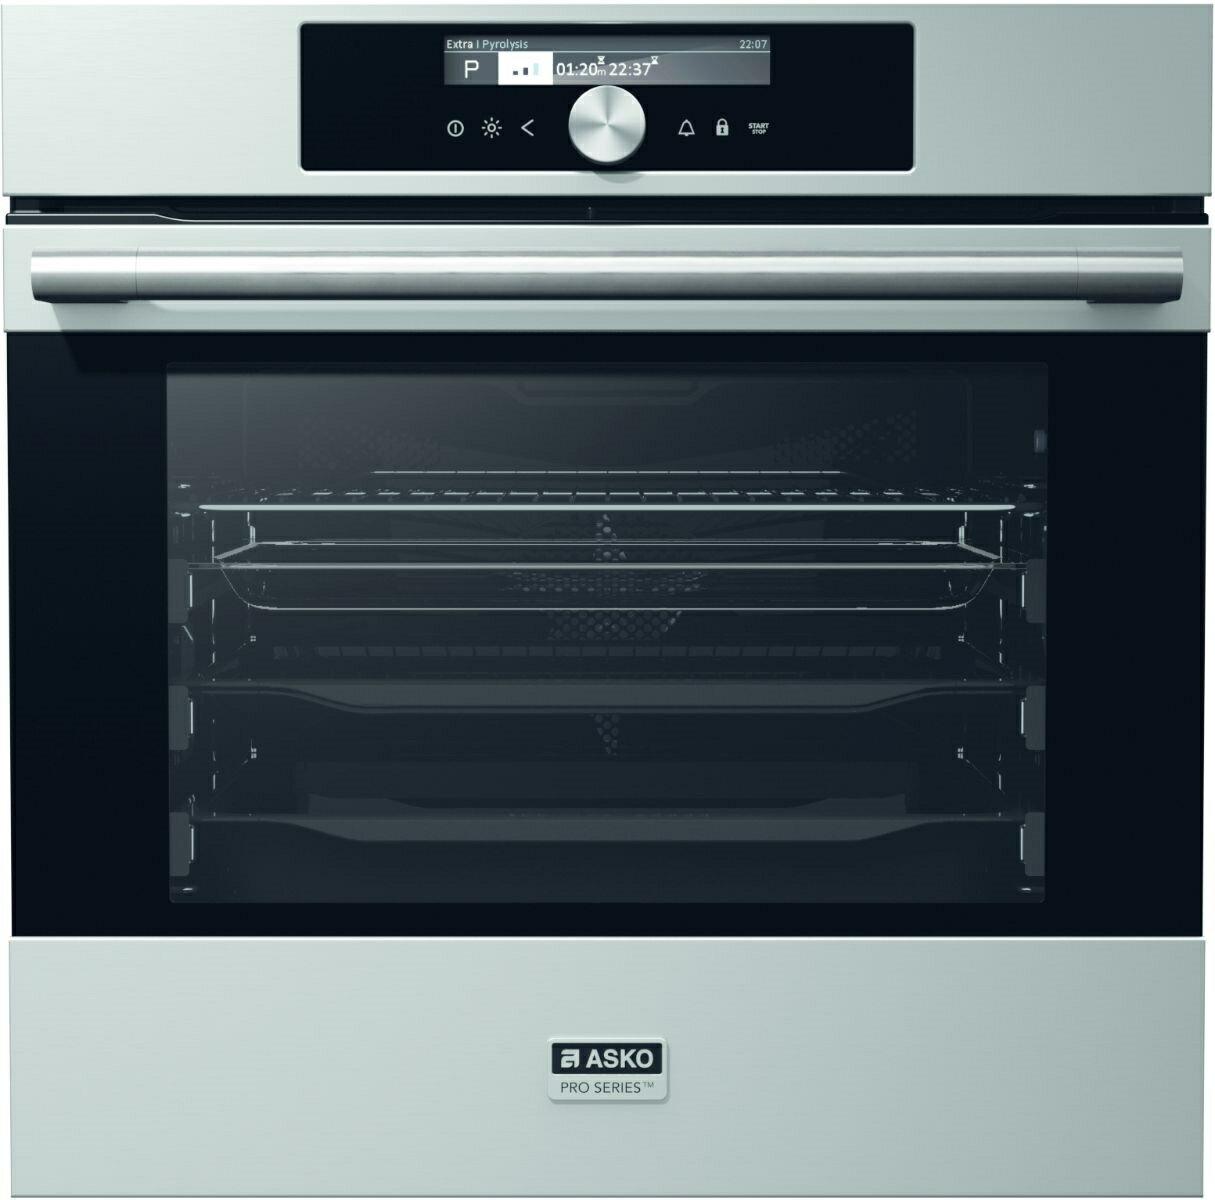 ASKO 瑞典賽寧 OP8656S 嵌入式熱解烤箱【零利率】 ※熱線07-7428010